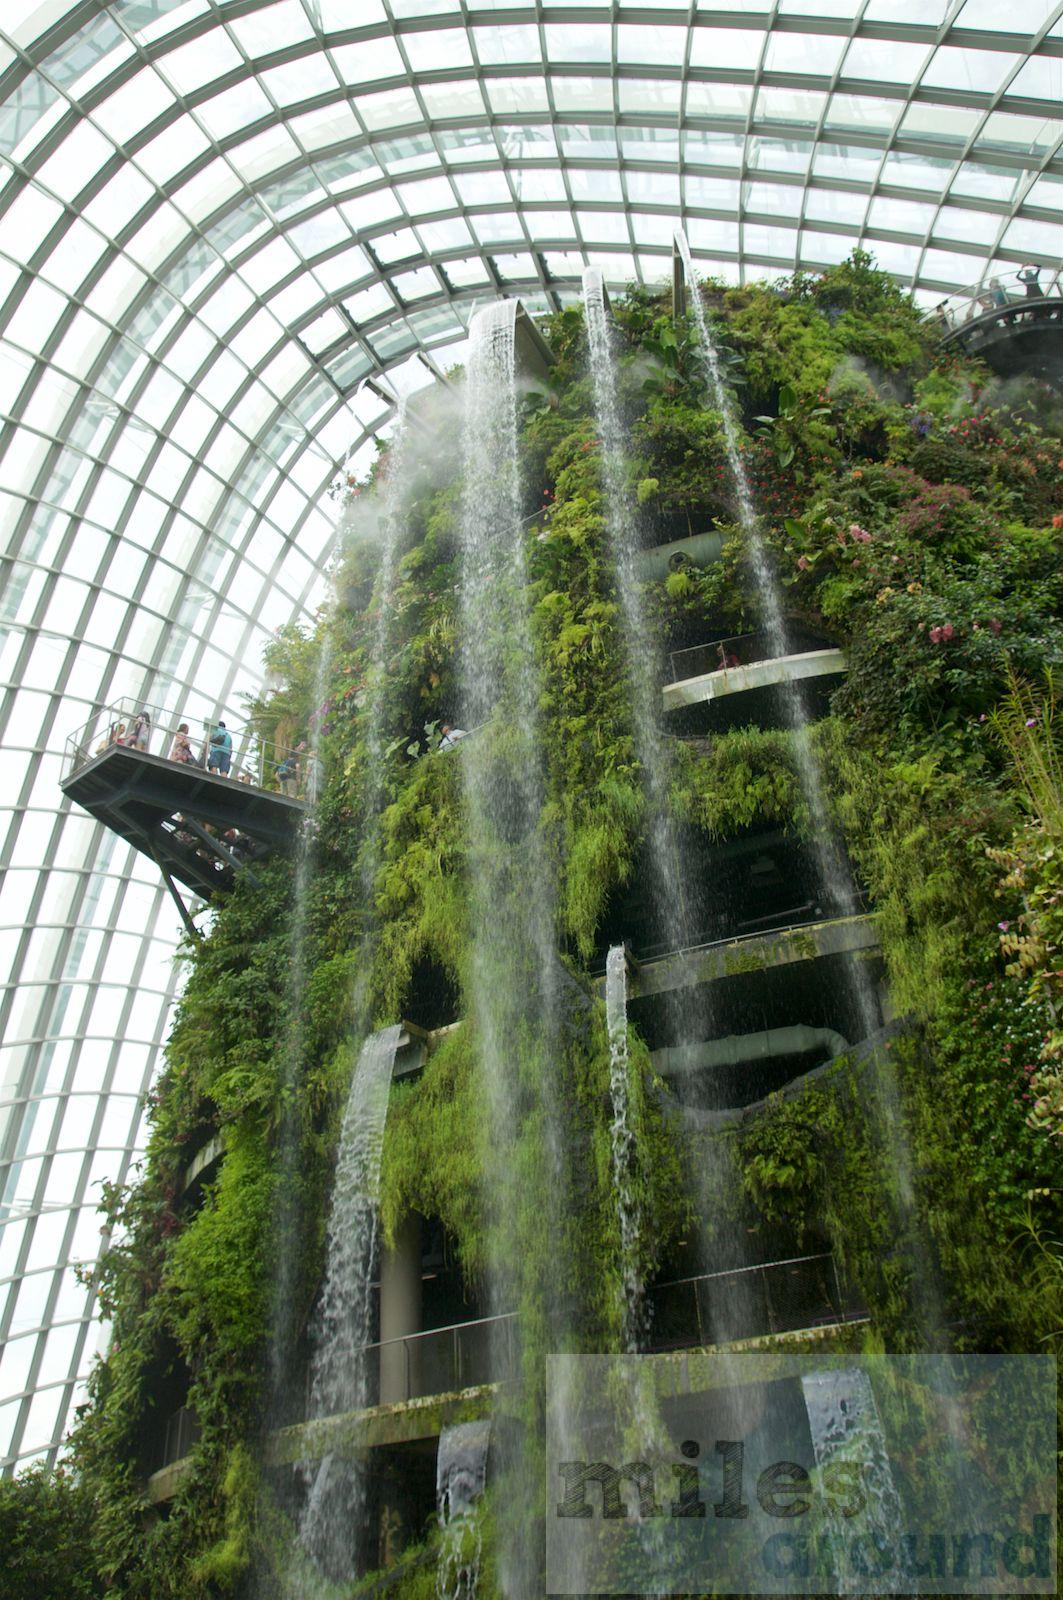 Gardens by the Bay grüne Oase in Singapur (Reisebericht